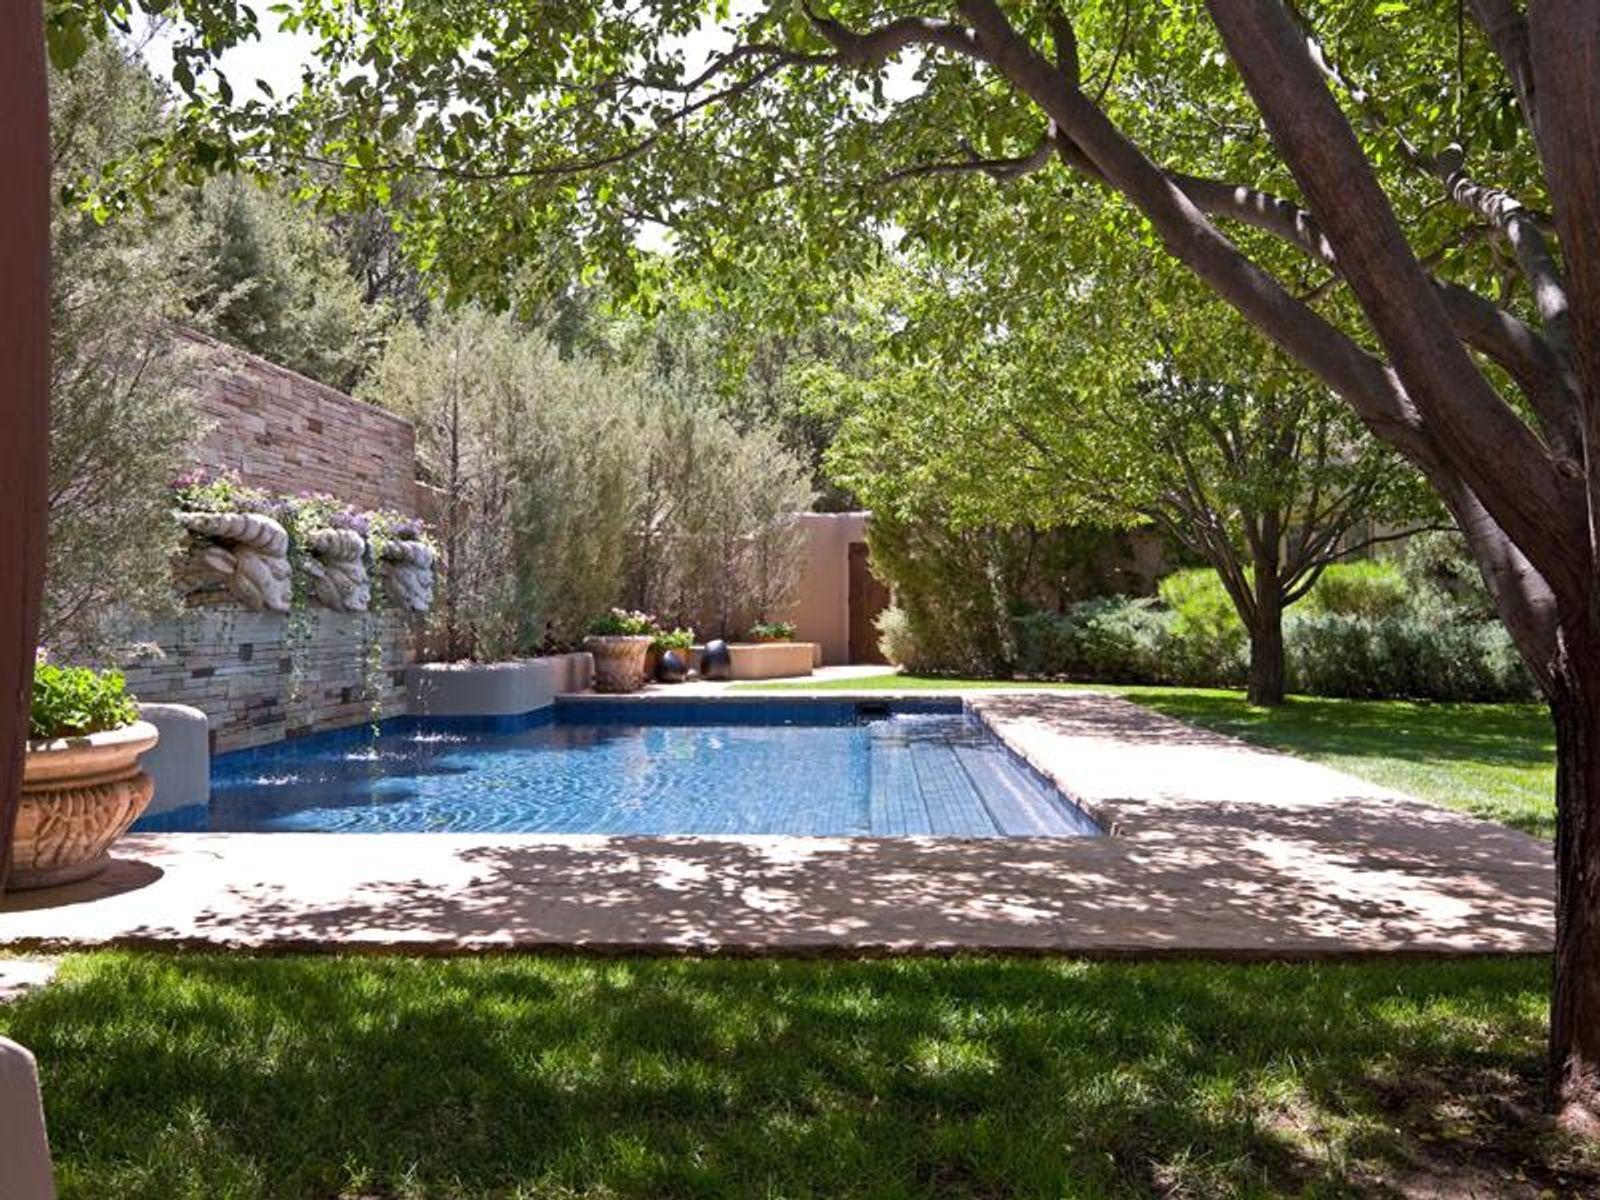 Idyllic backyard, w/lush swath of lawn, pool & hot